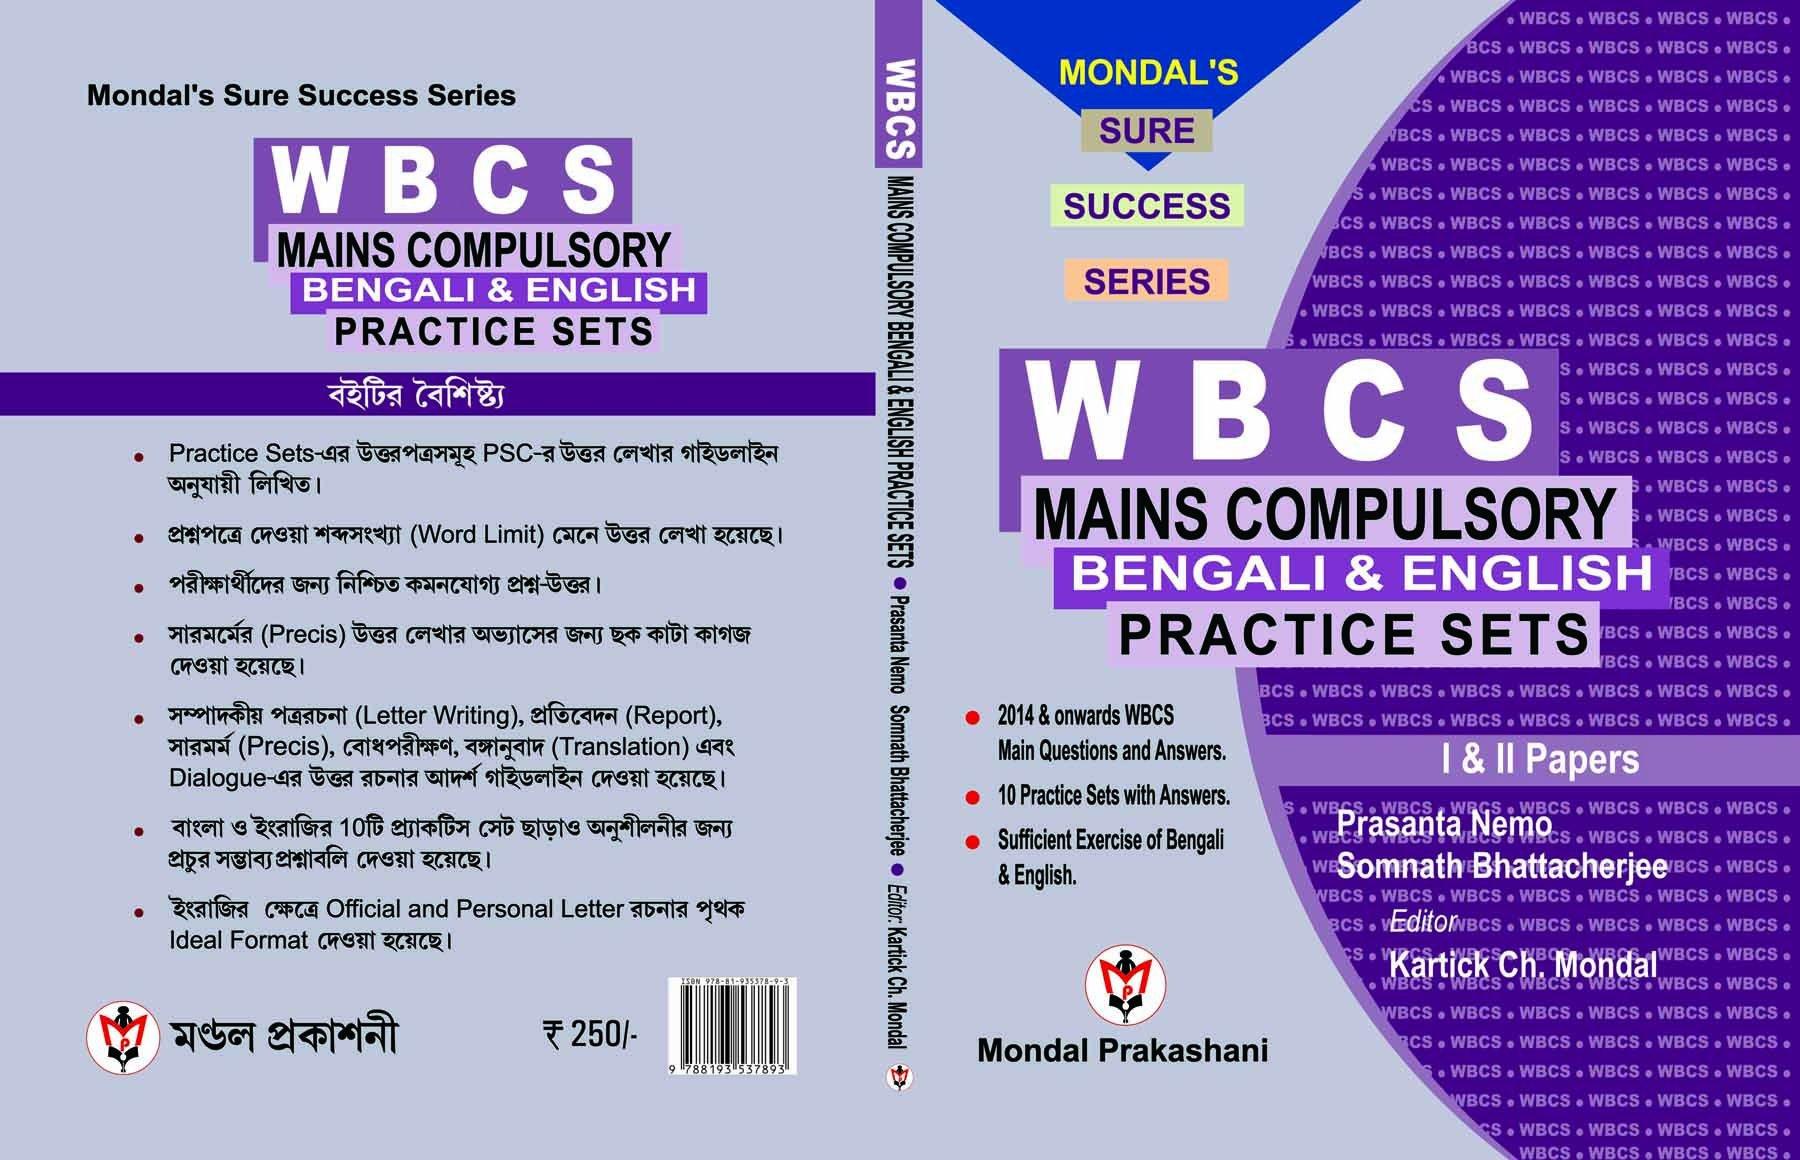 Buy WBCS MAINS COMPULSORY BENGALI & ENGLISH PRACTICE SETS